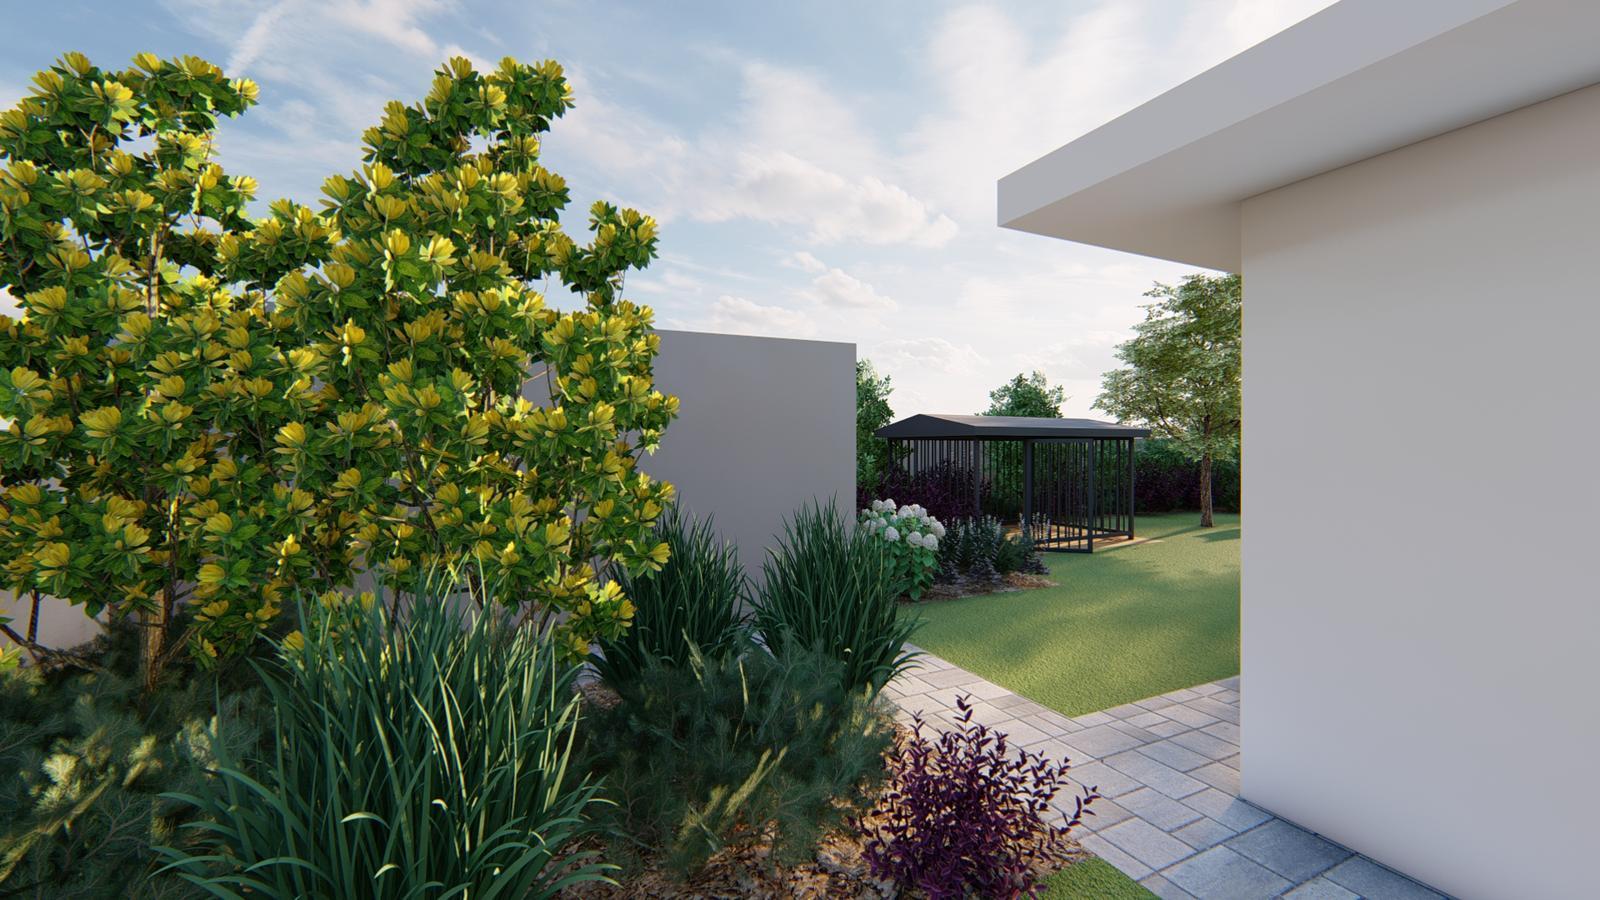 Návrh záhrady rodinného domu - Obrázok č. 33